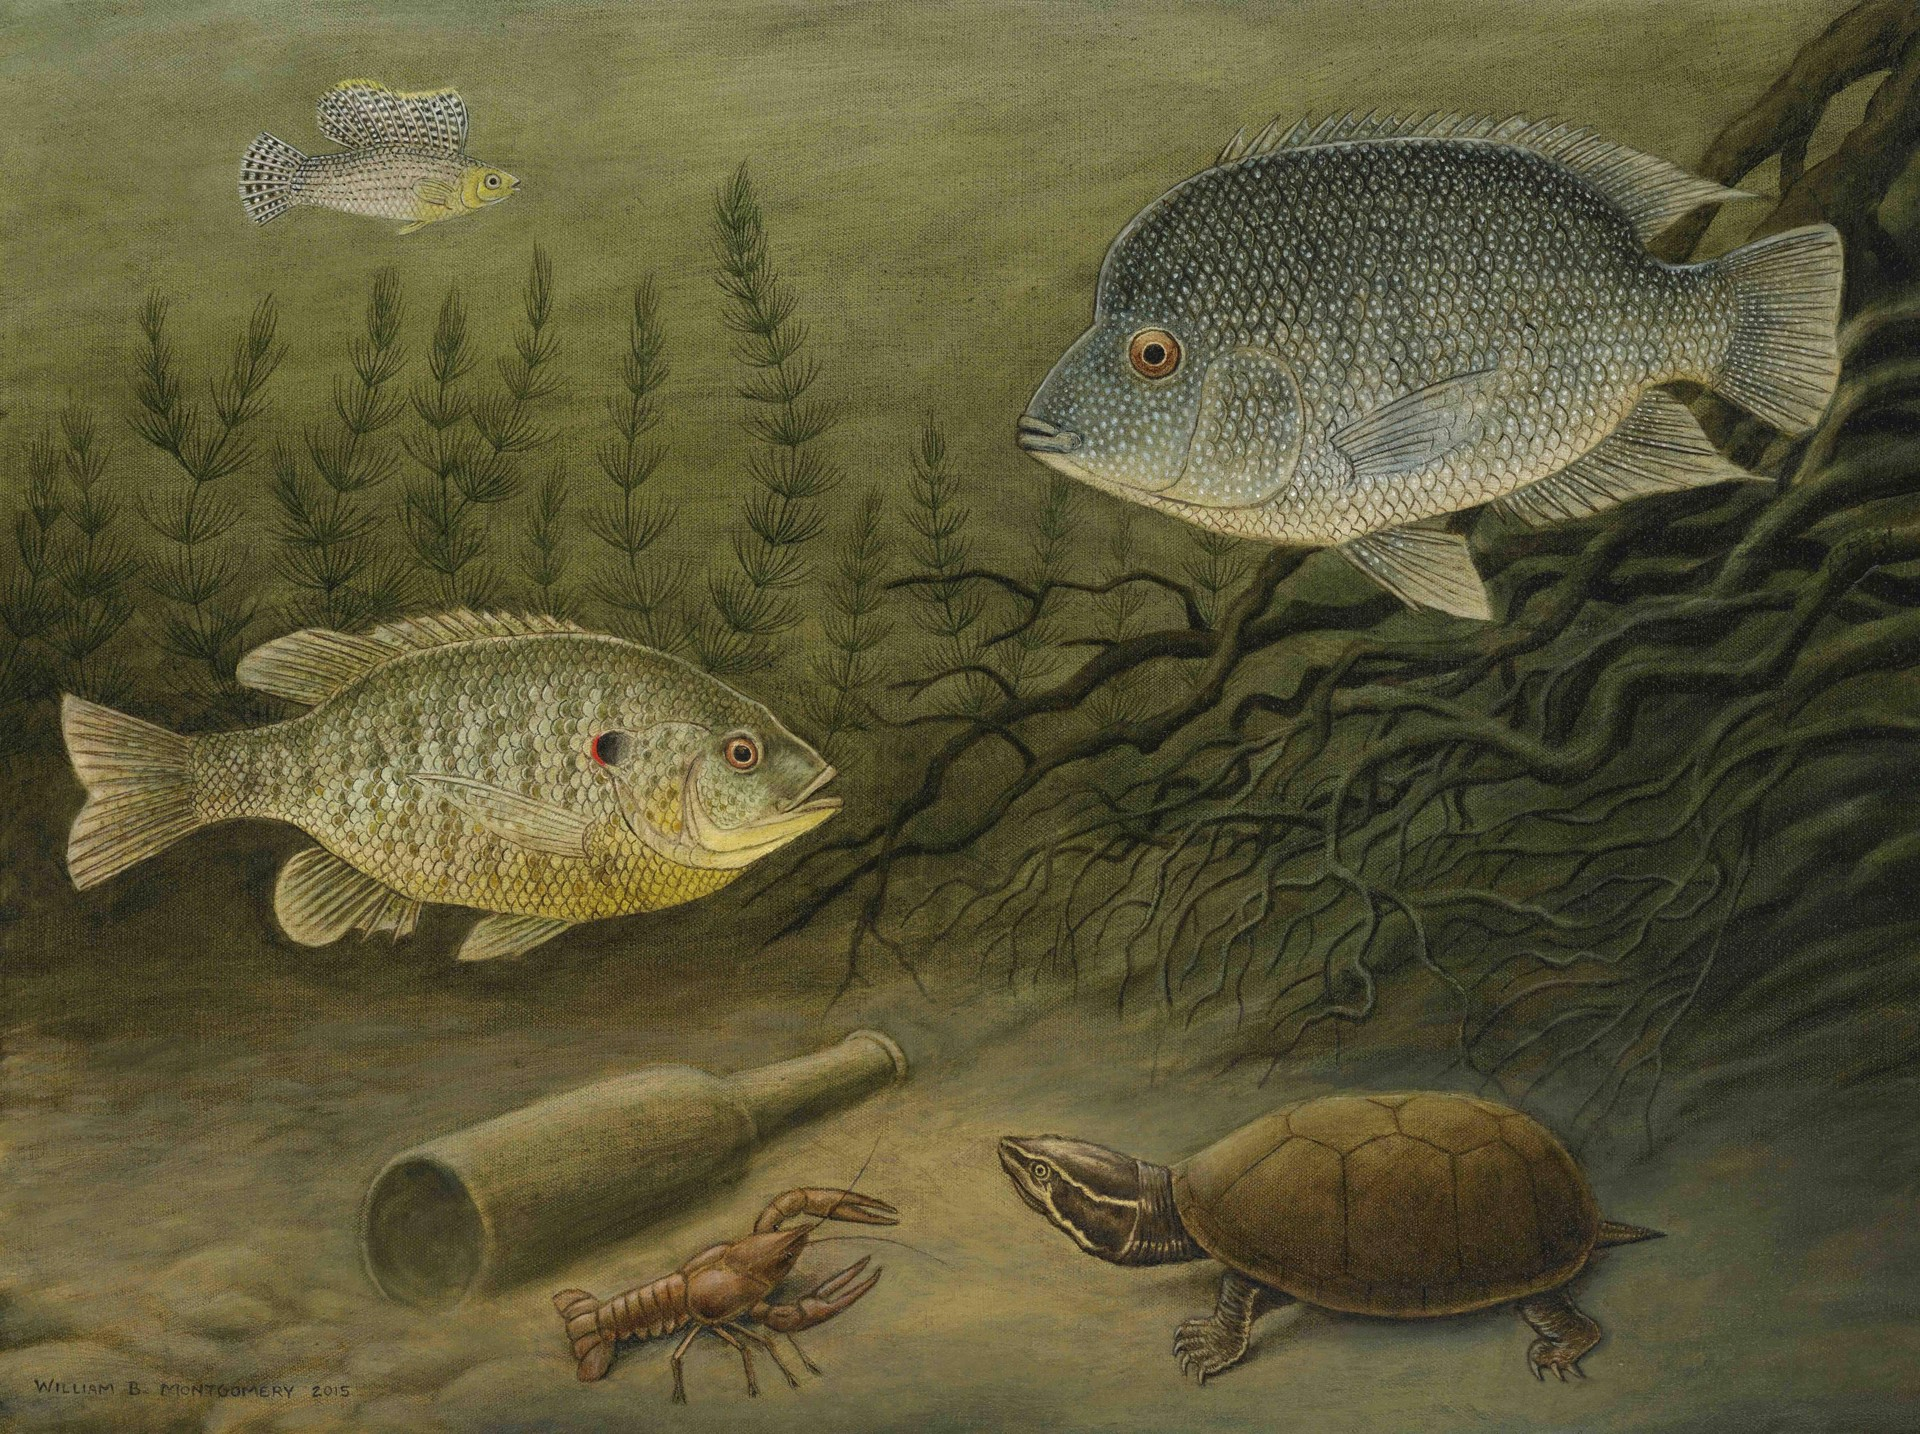 Fish & Musk Turtle by William B. Montgomery